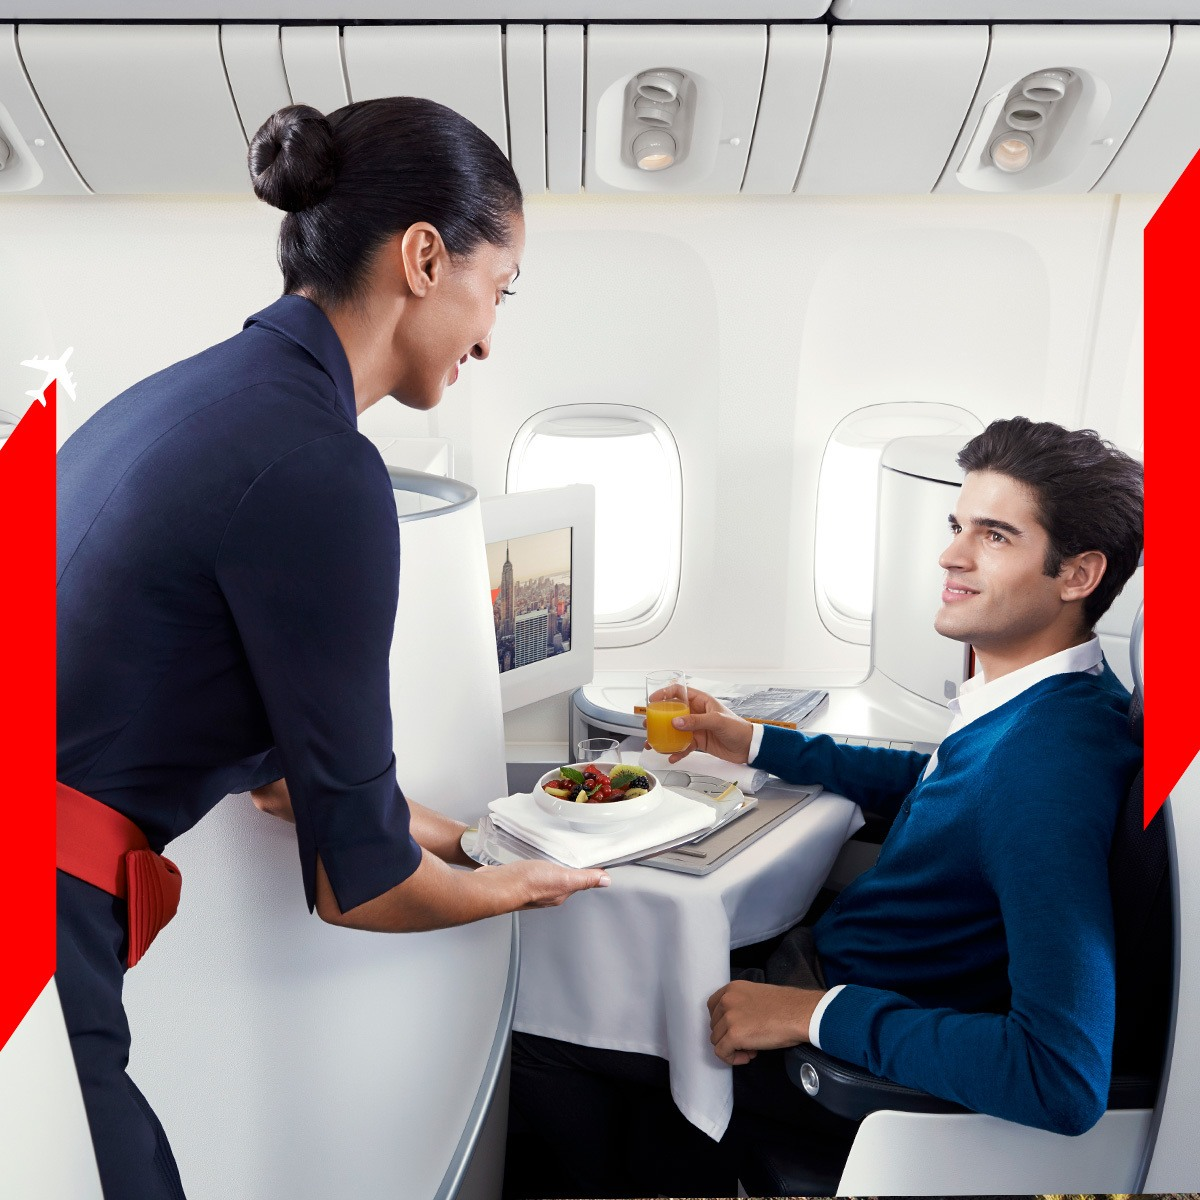 The sleek business class cabin on Air France.